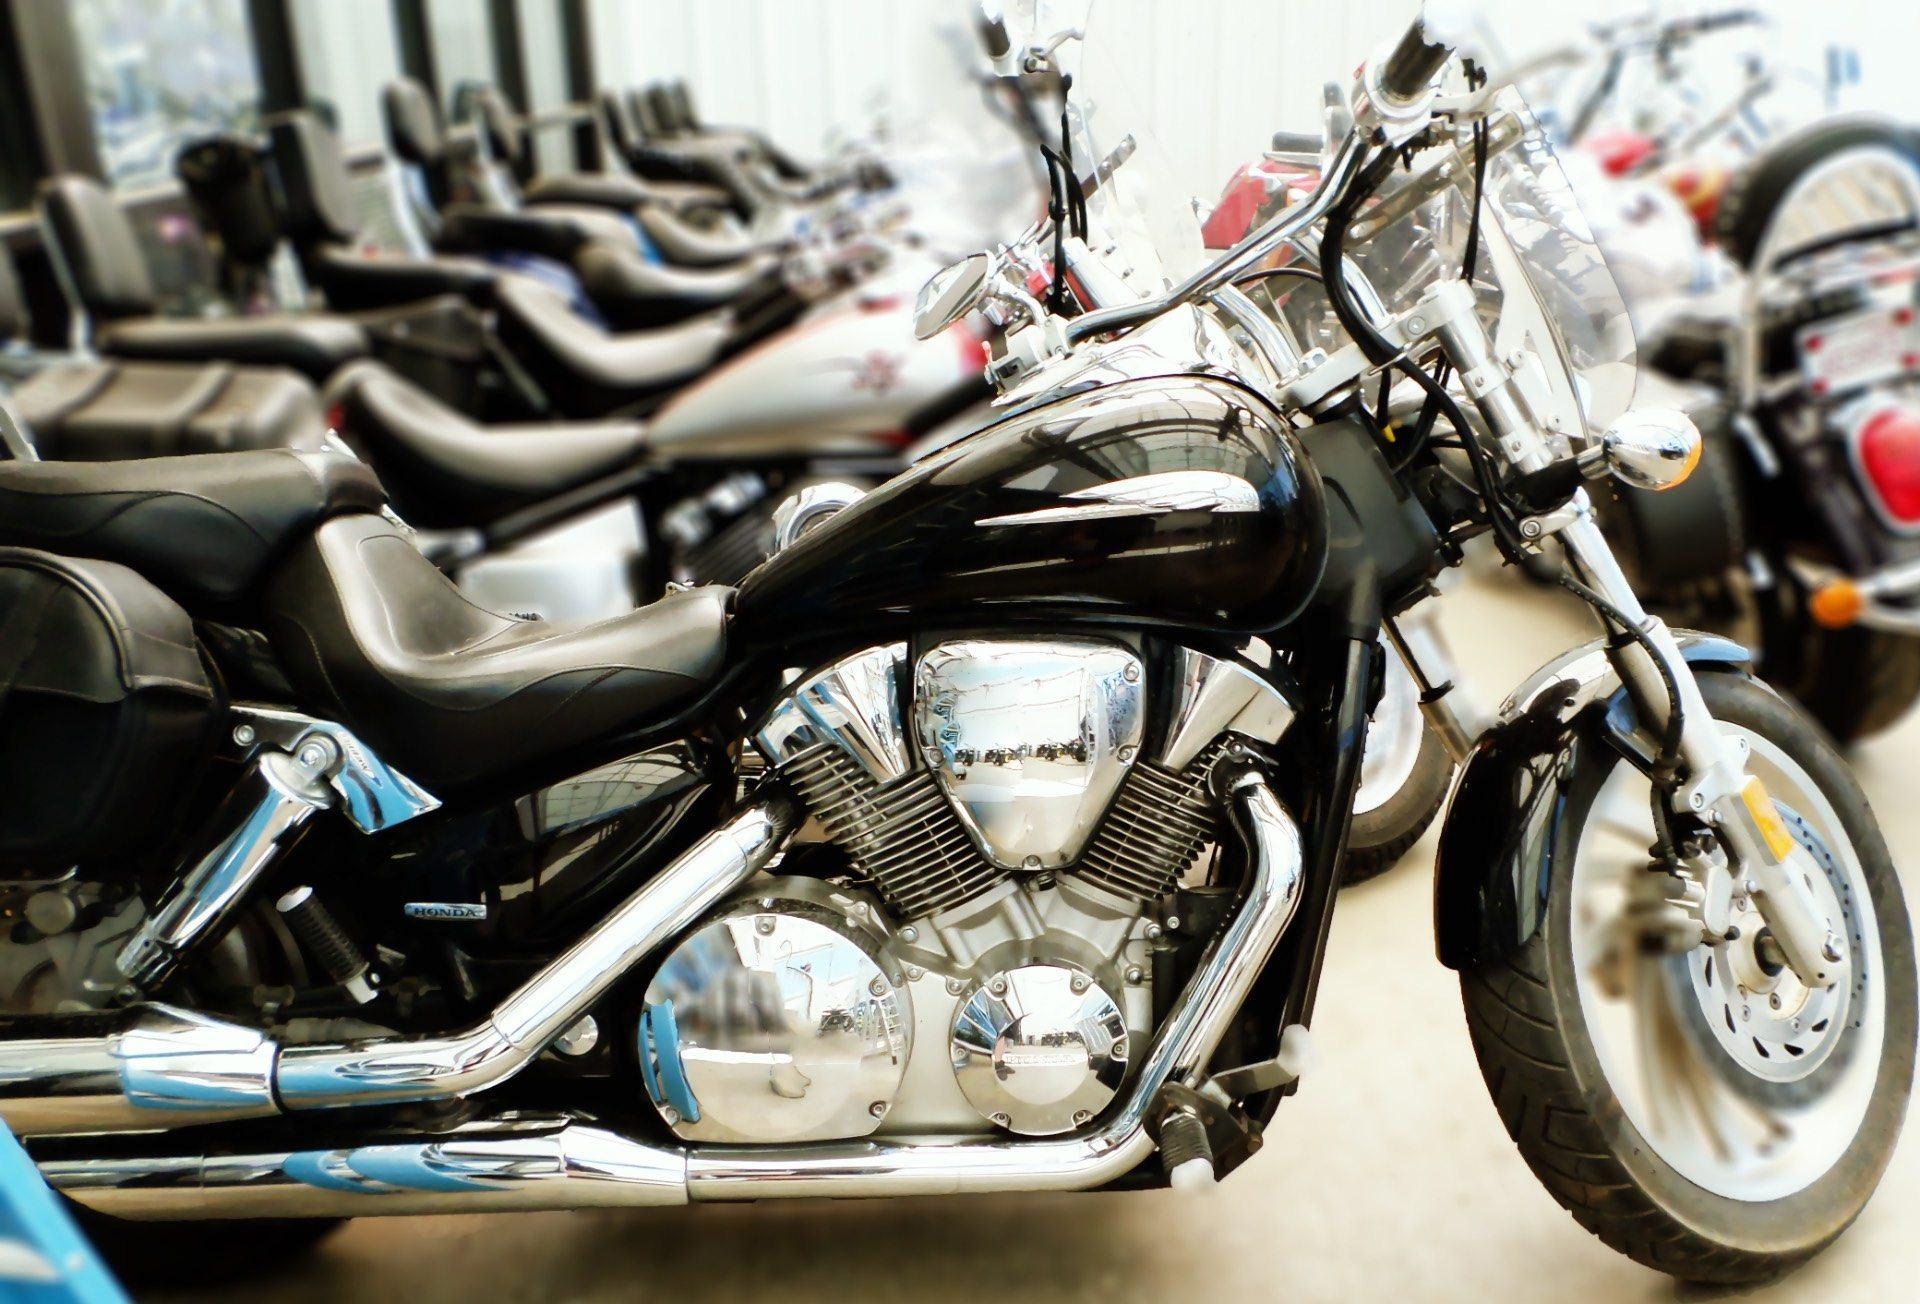 2000 Yamaha V Star 1100 Custom For Sale